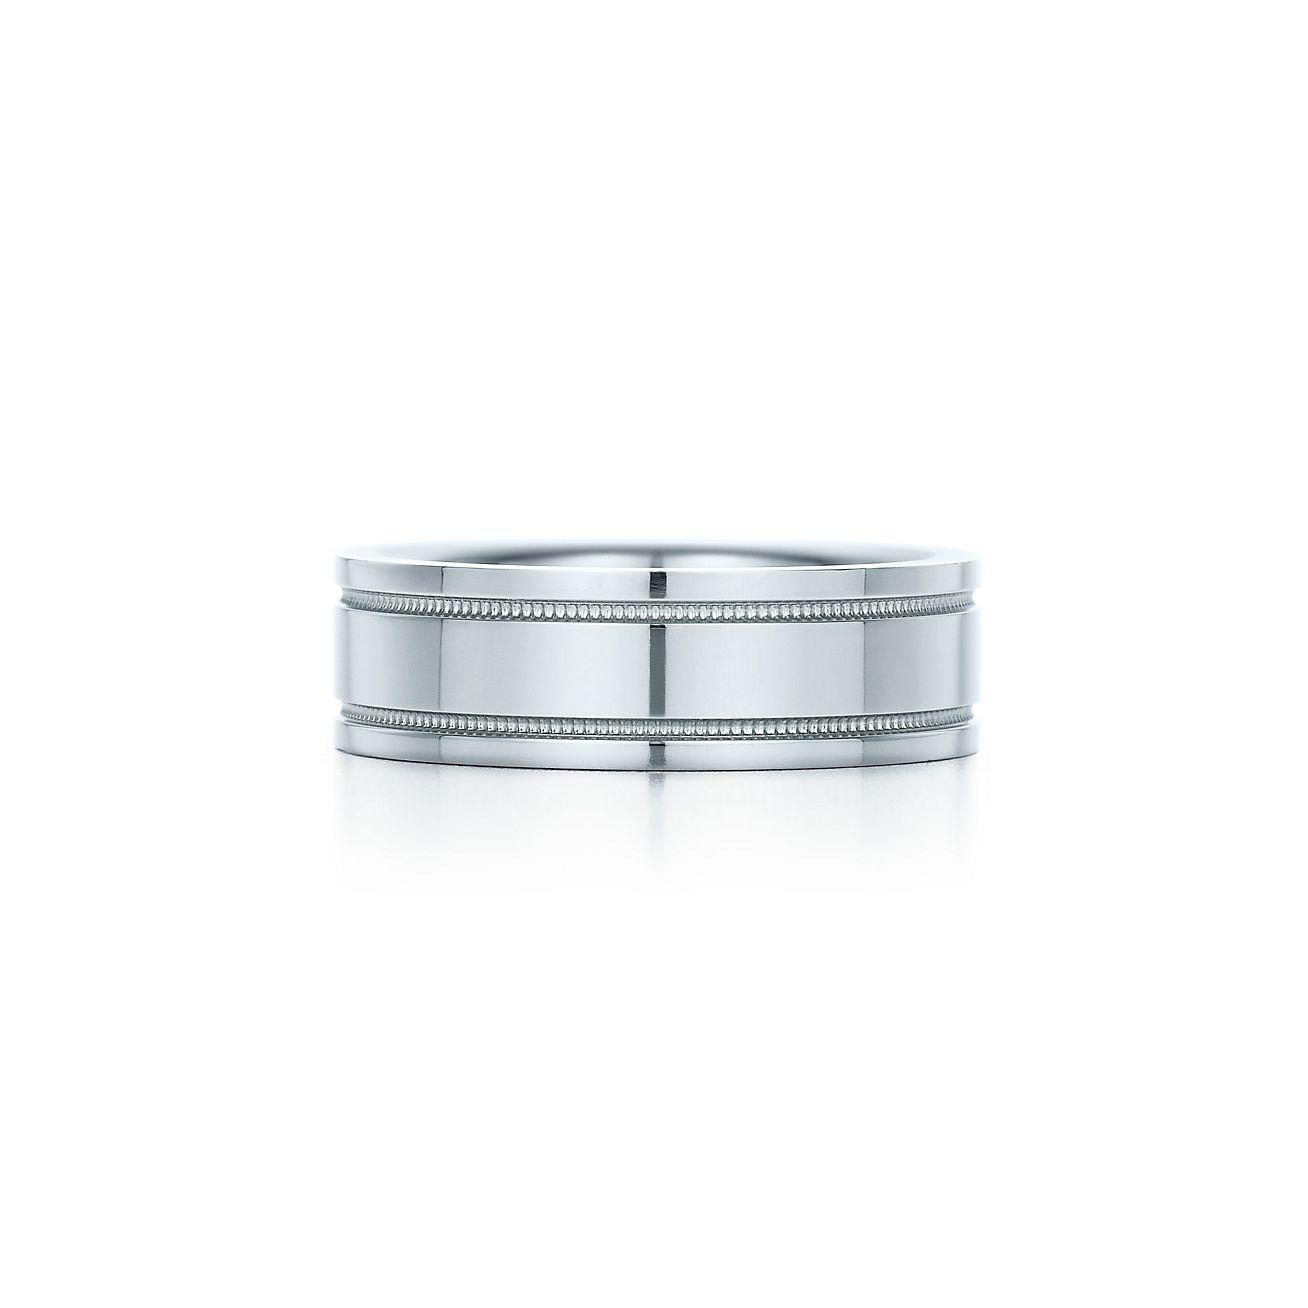 Tiffany flat double milgrain wedding band ring in platinum 6 mm tiffany flat doublebrmilgrain weddingbrband ring junglespirit Image collections